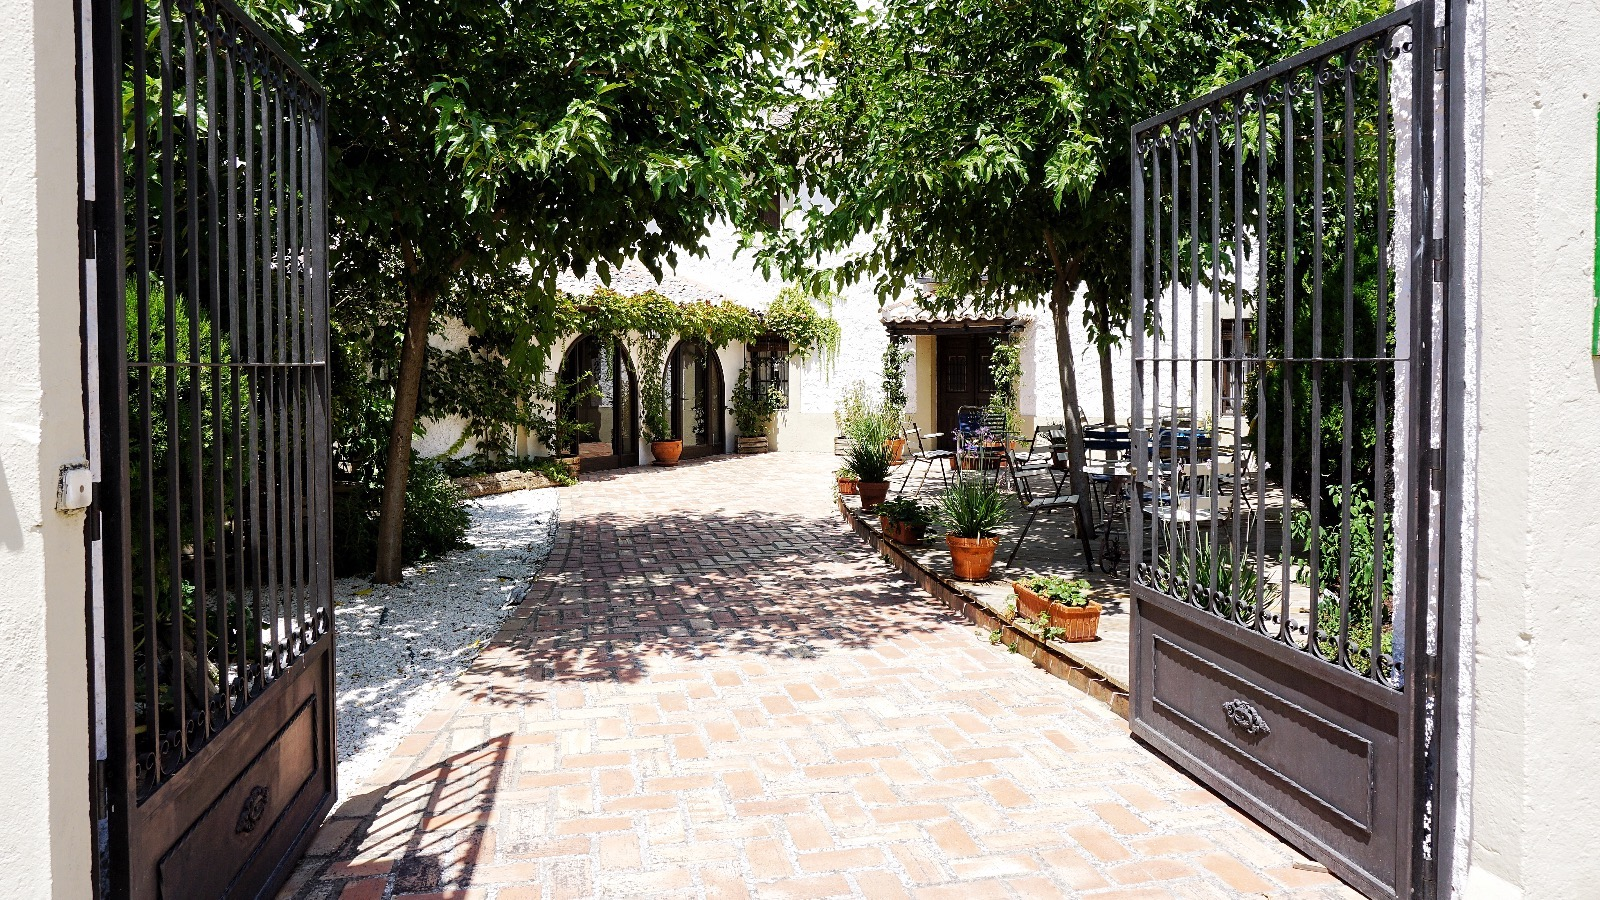 Detalle de la entrada a Casa Elena